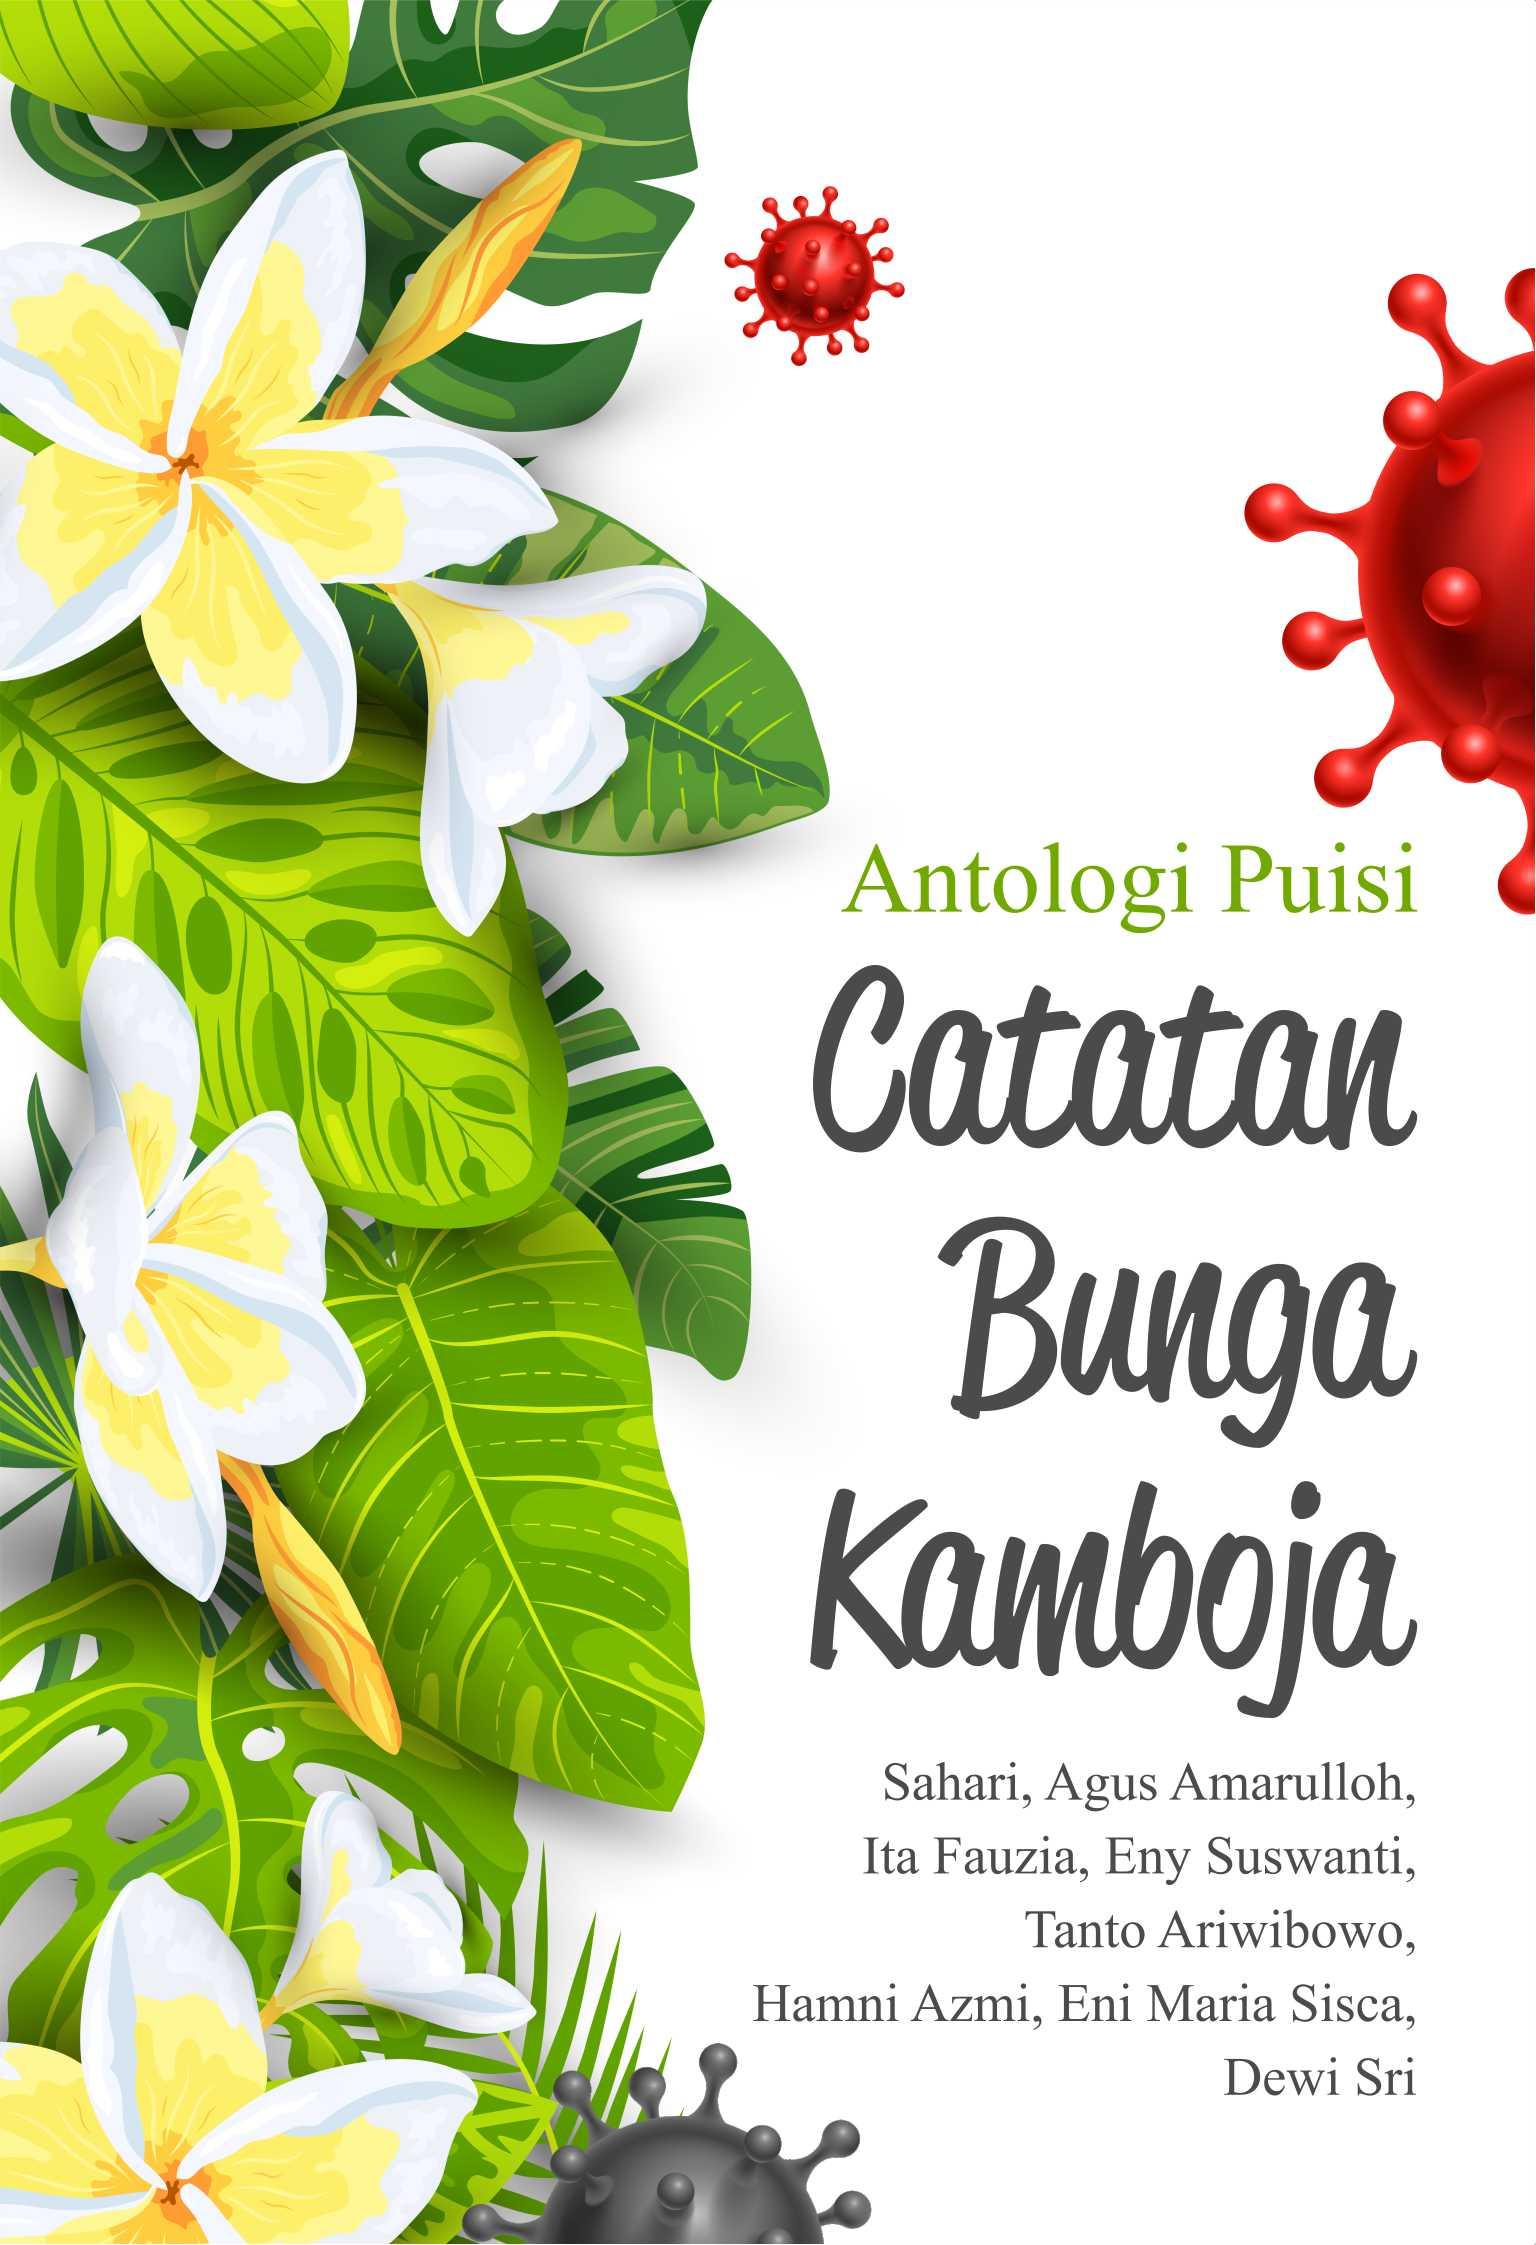 Catatan bunga kamboja [sumber elektronis] : antologi puisi